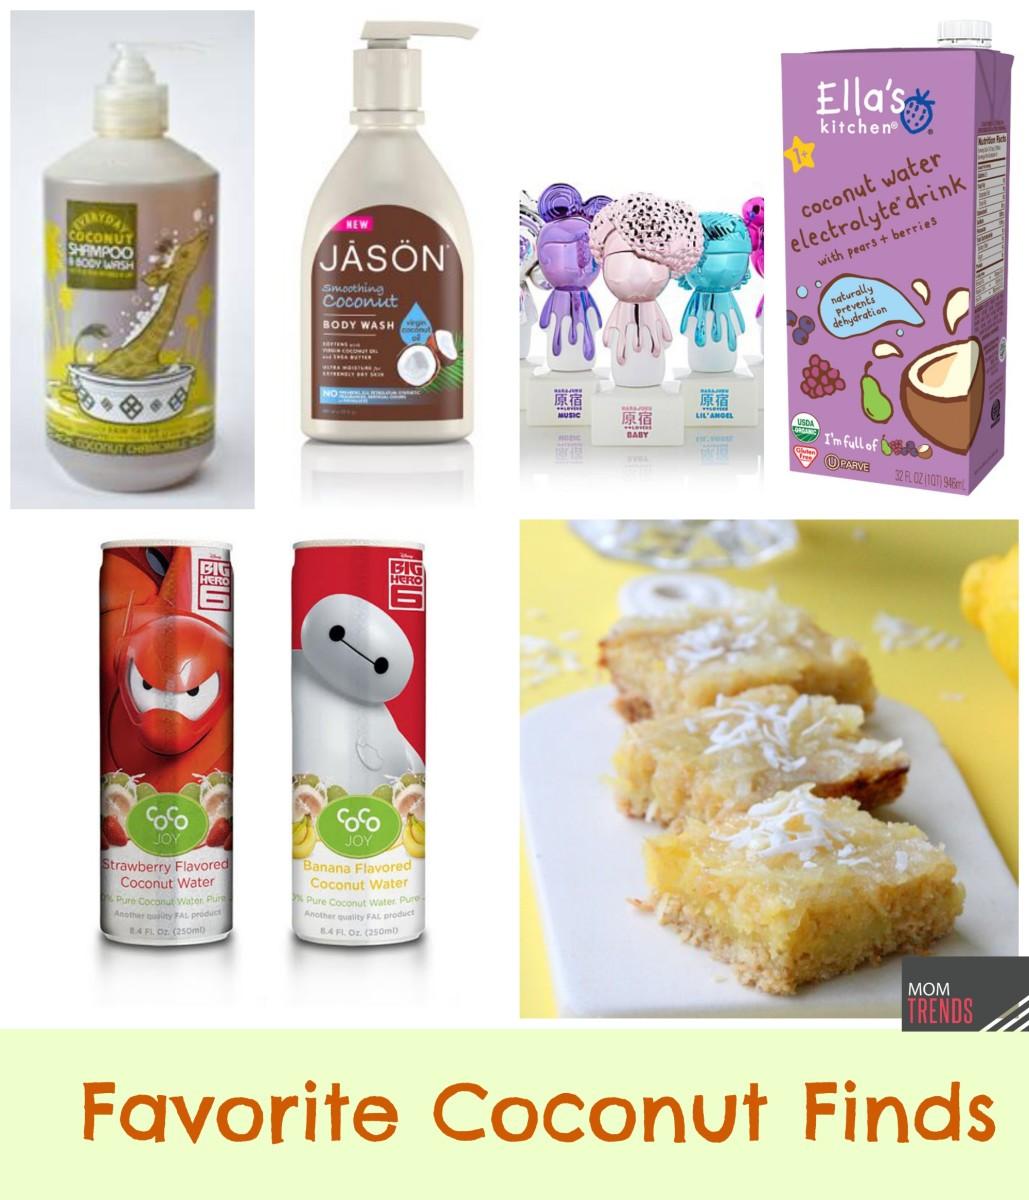 Favorite Coconut Finds